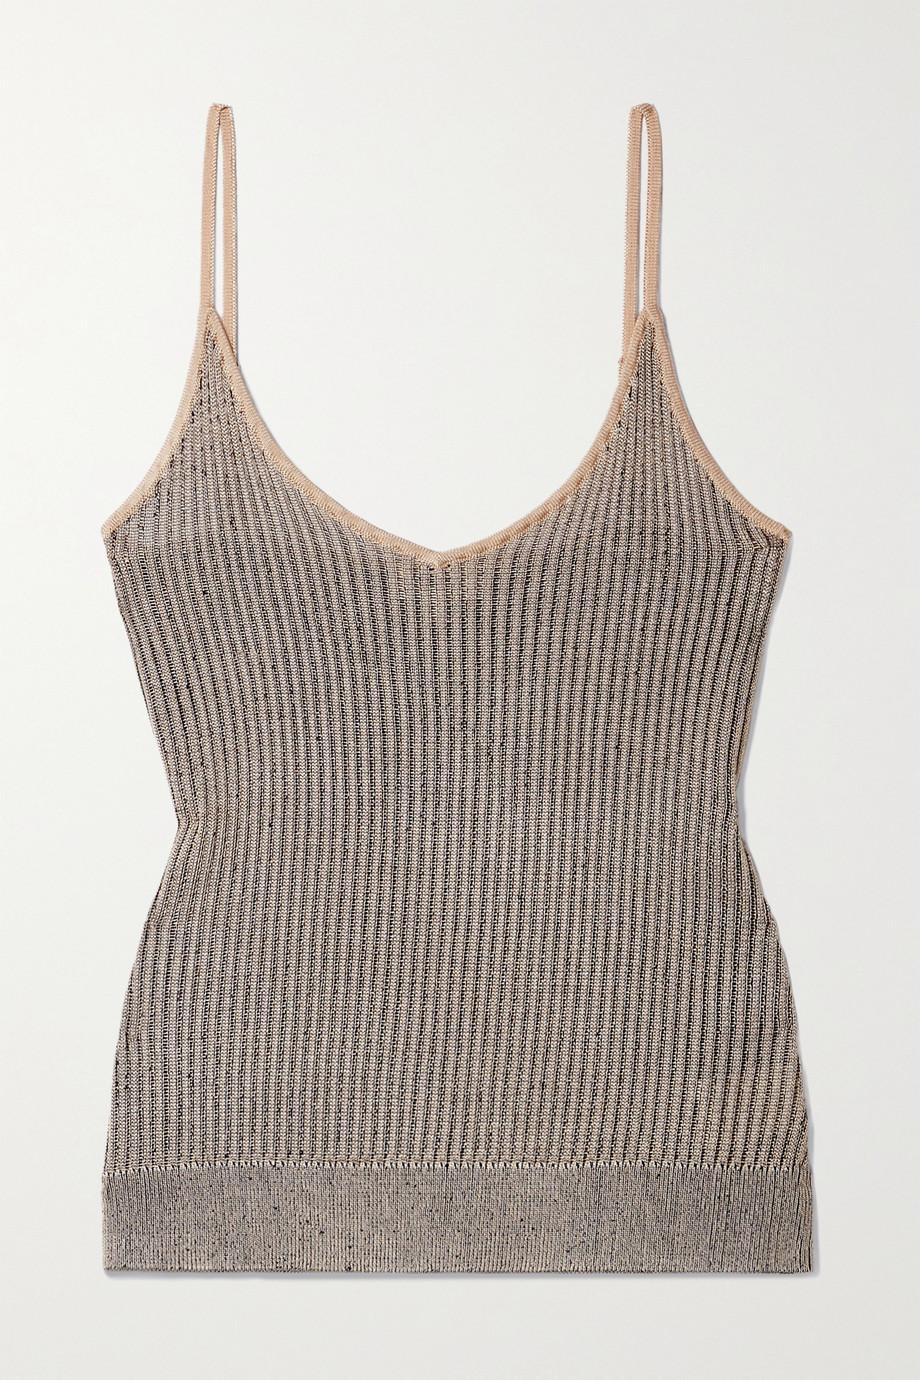 L'Agence Hayek ribbed-knit tank